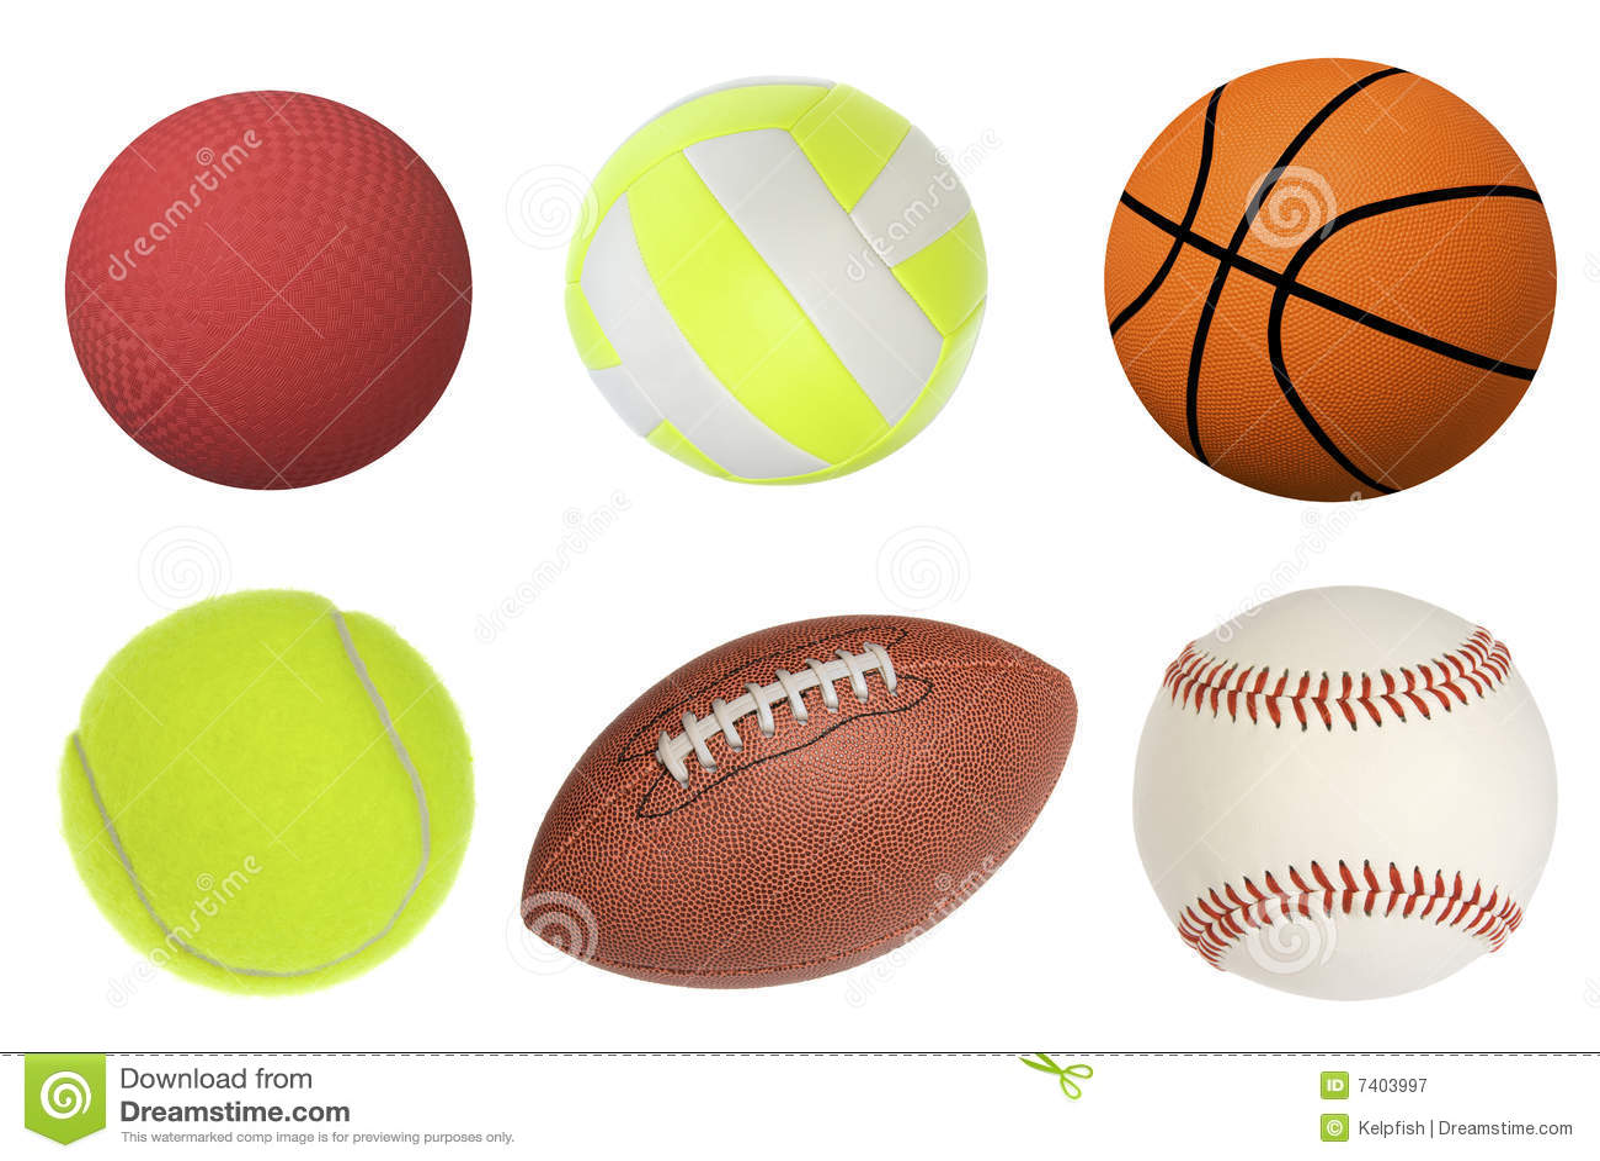 balls online